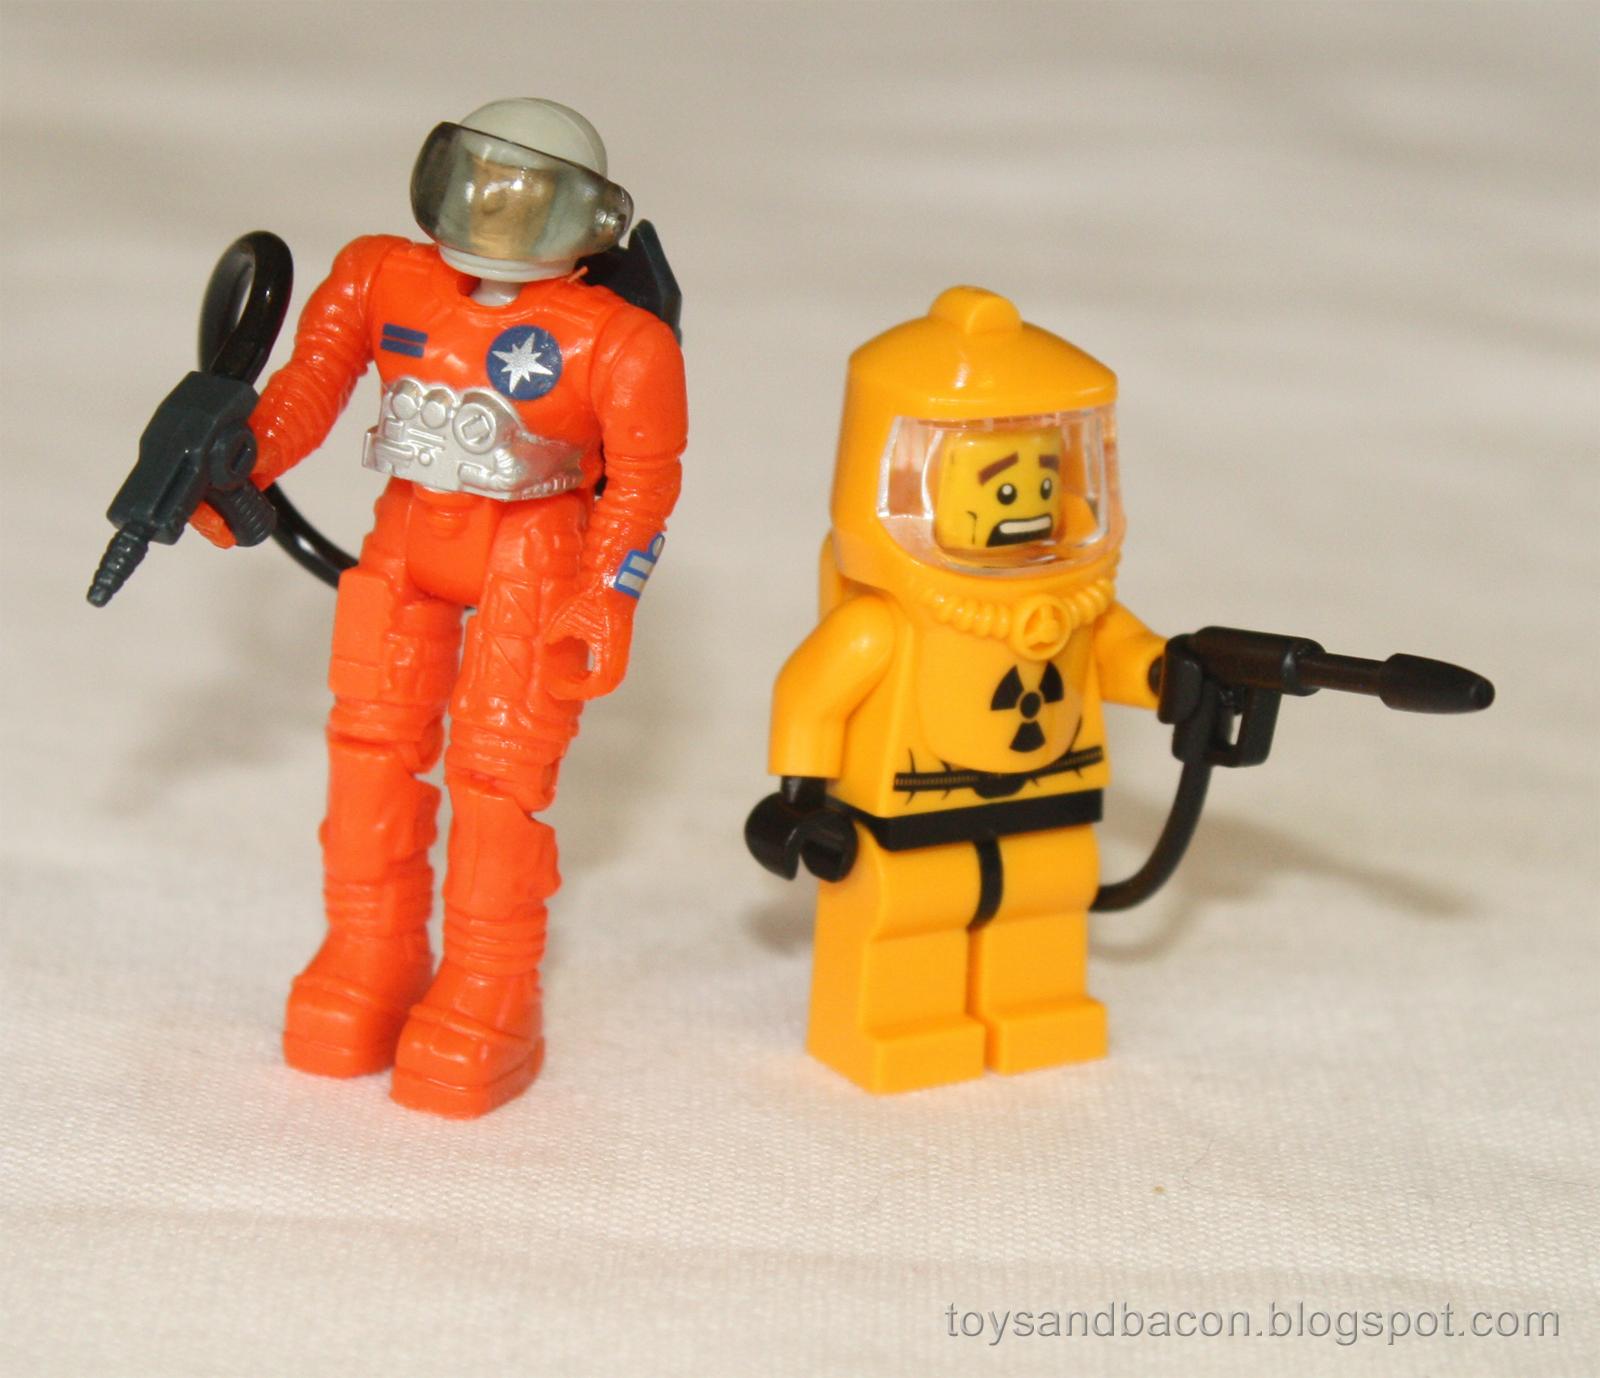 Lego Figures Toys : Toys and bacon top collectible lego minifigures